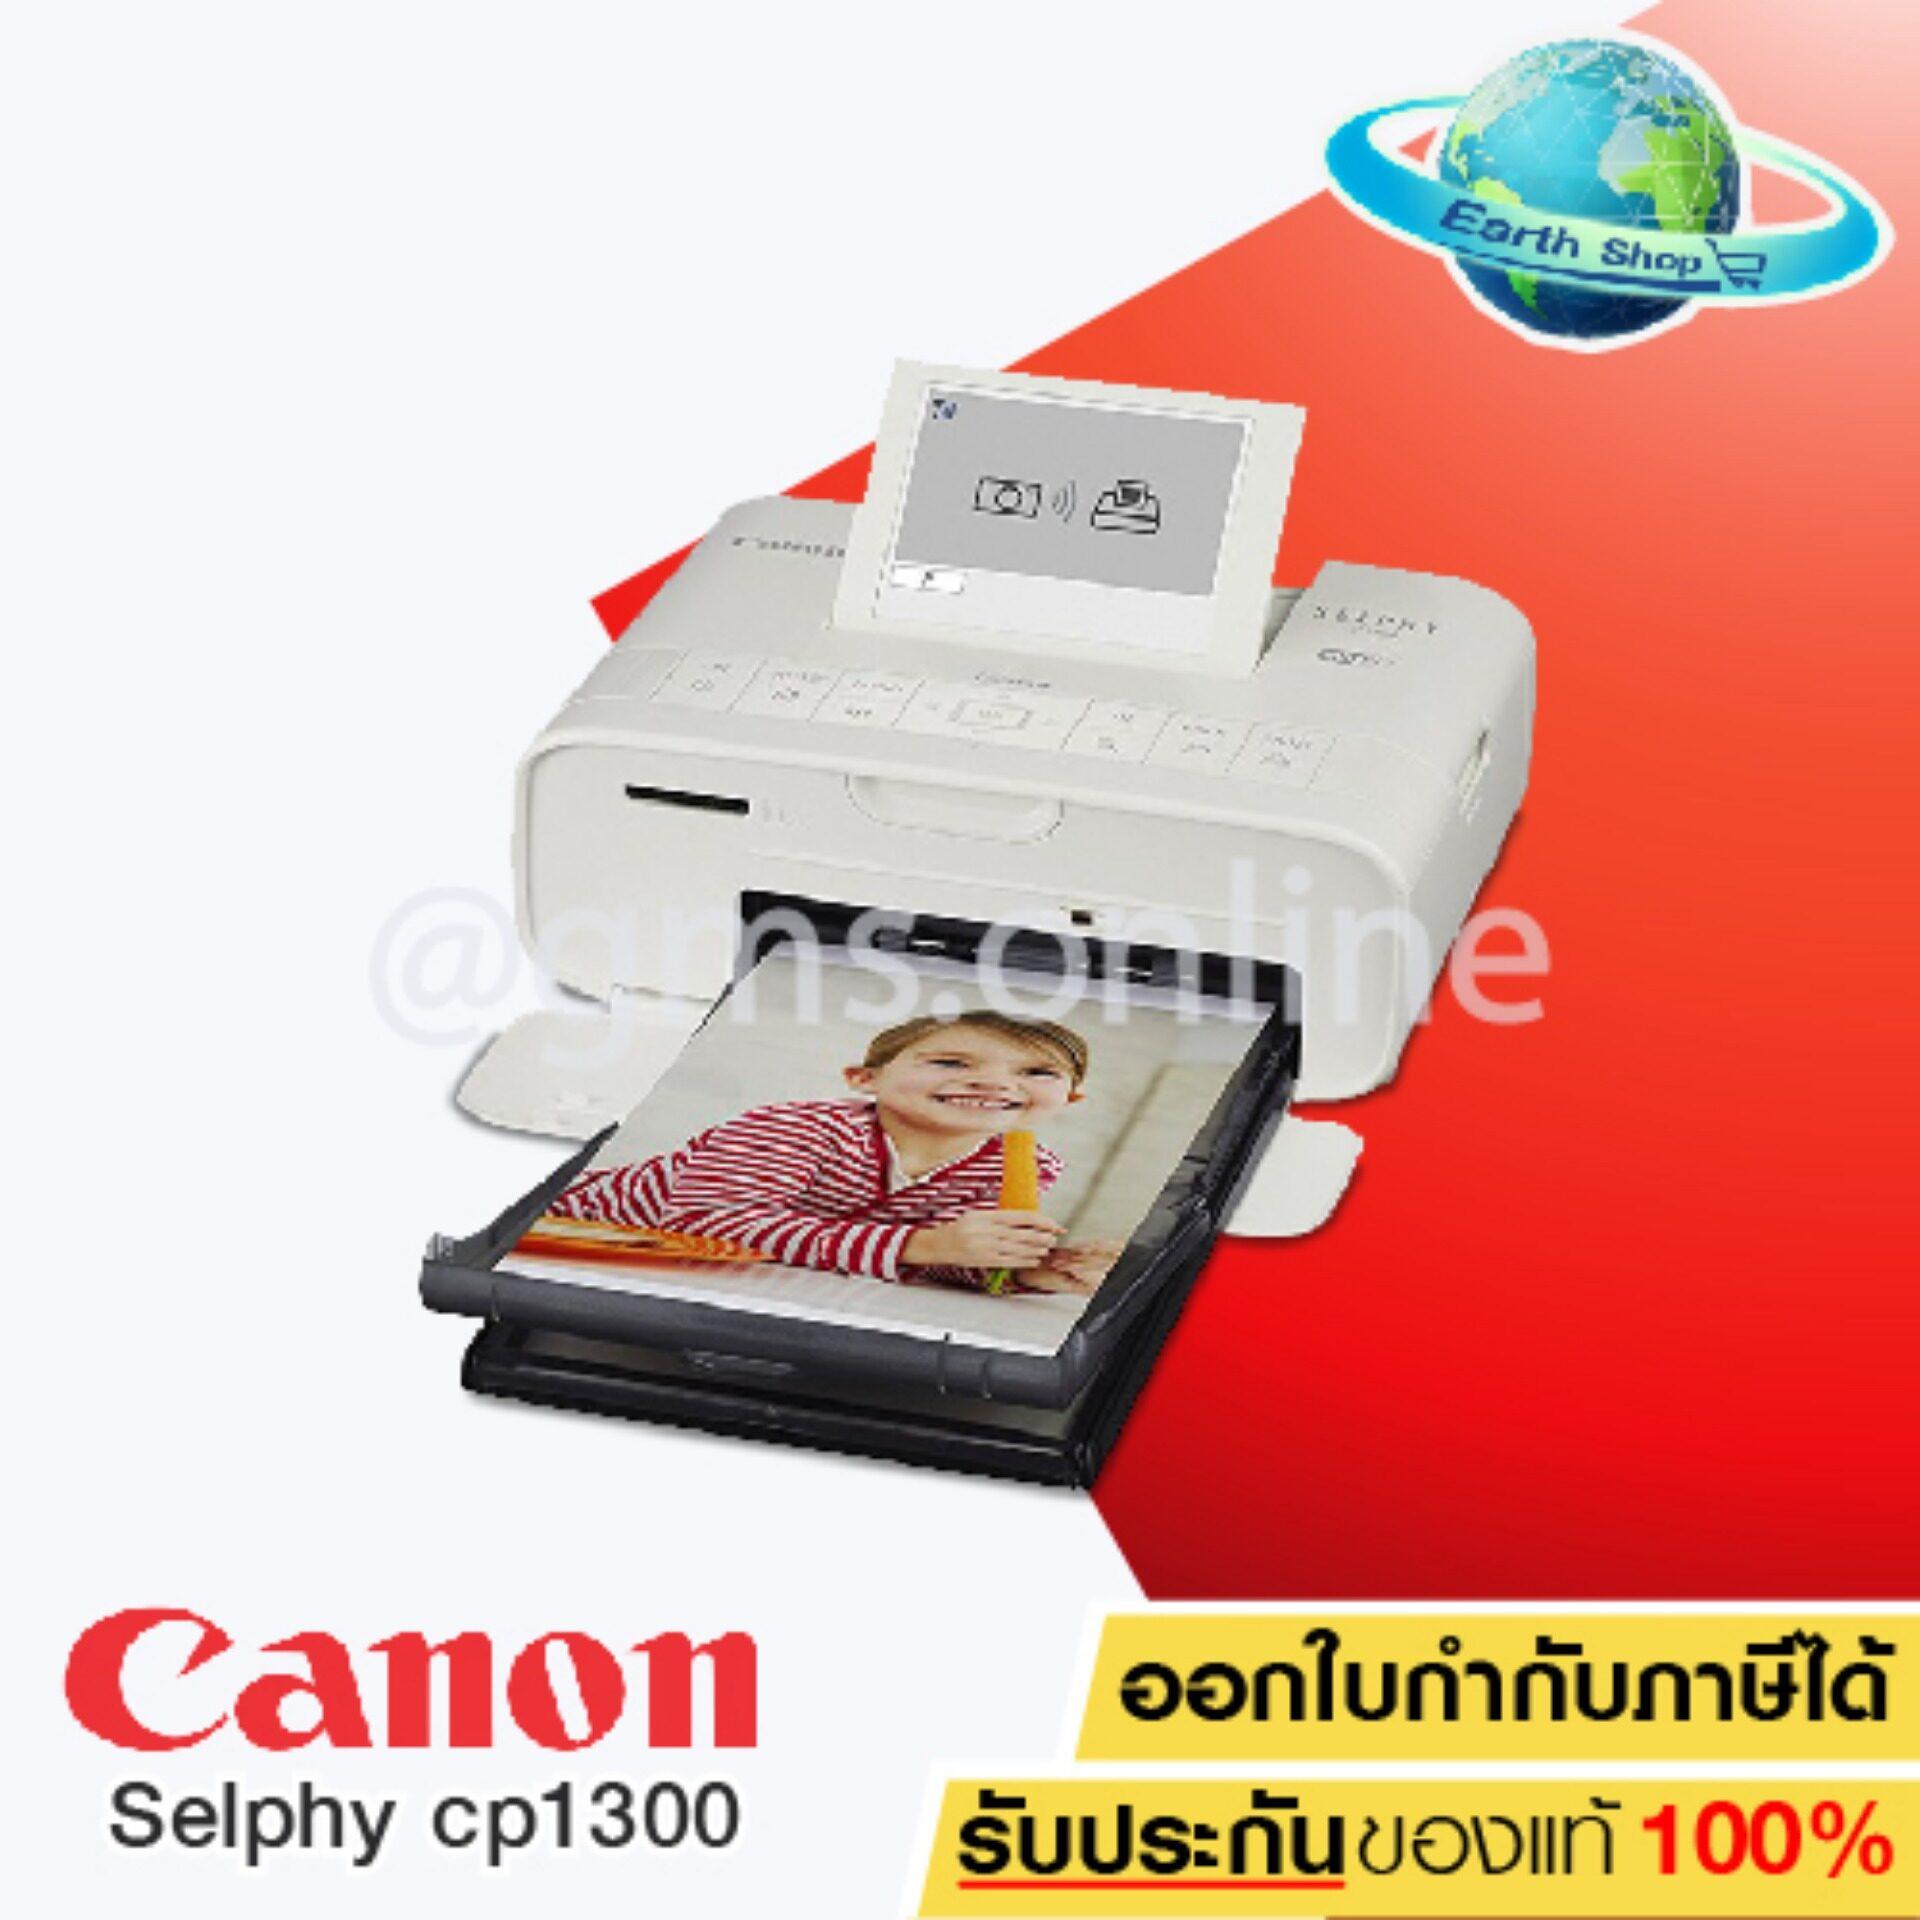 Earth Shop Canon Selphy Cp1300 Photo Printer โฟโต้พรินเตอร์ไร้สาย ถูกที่สุด Earth Shop.